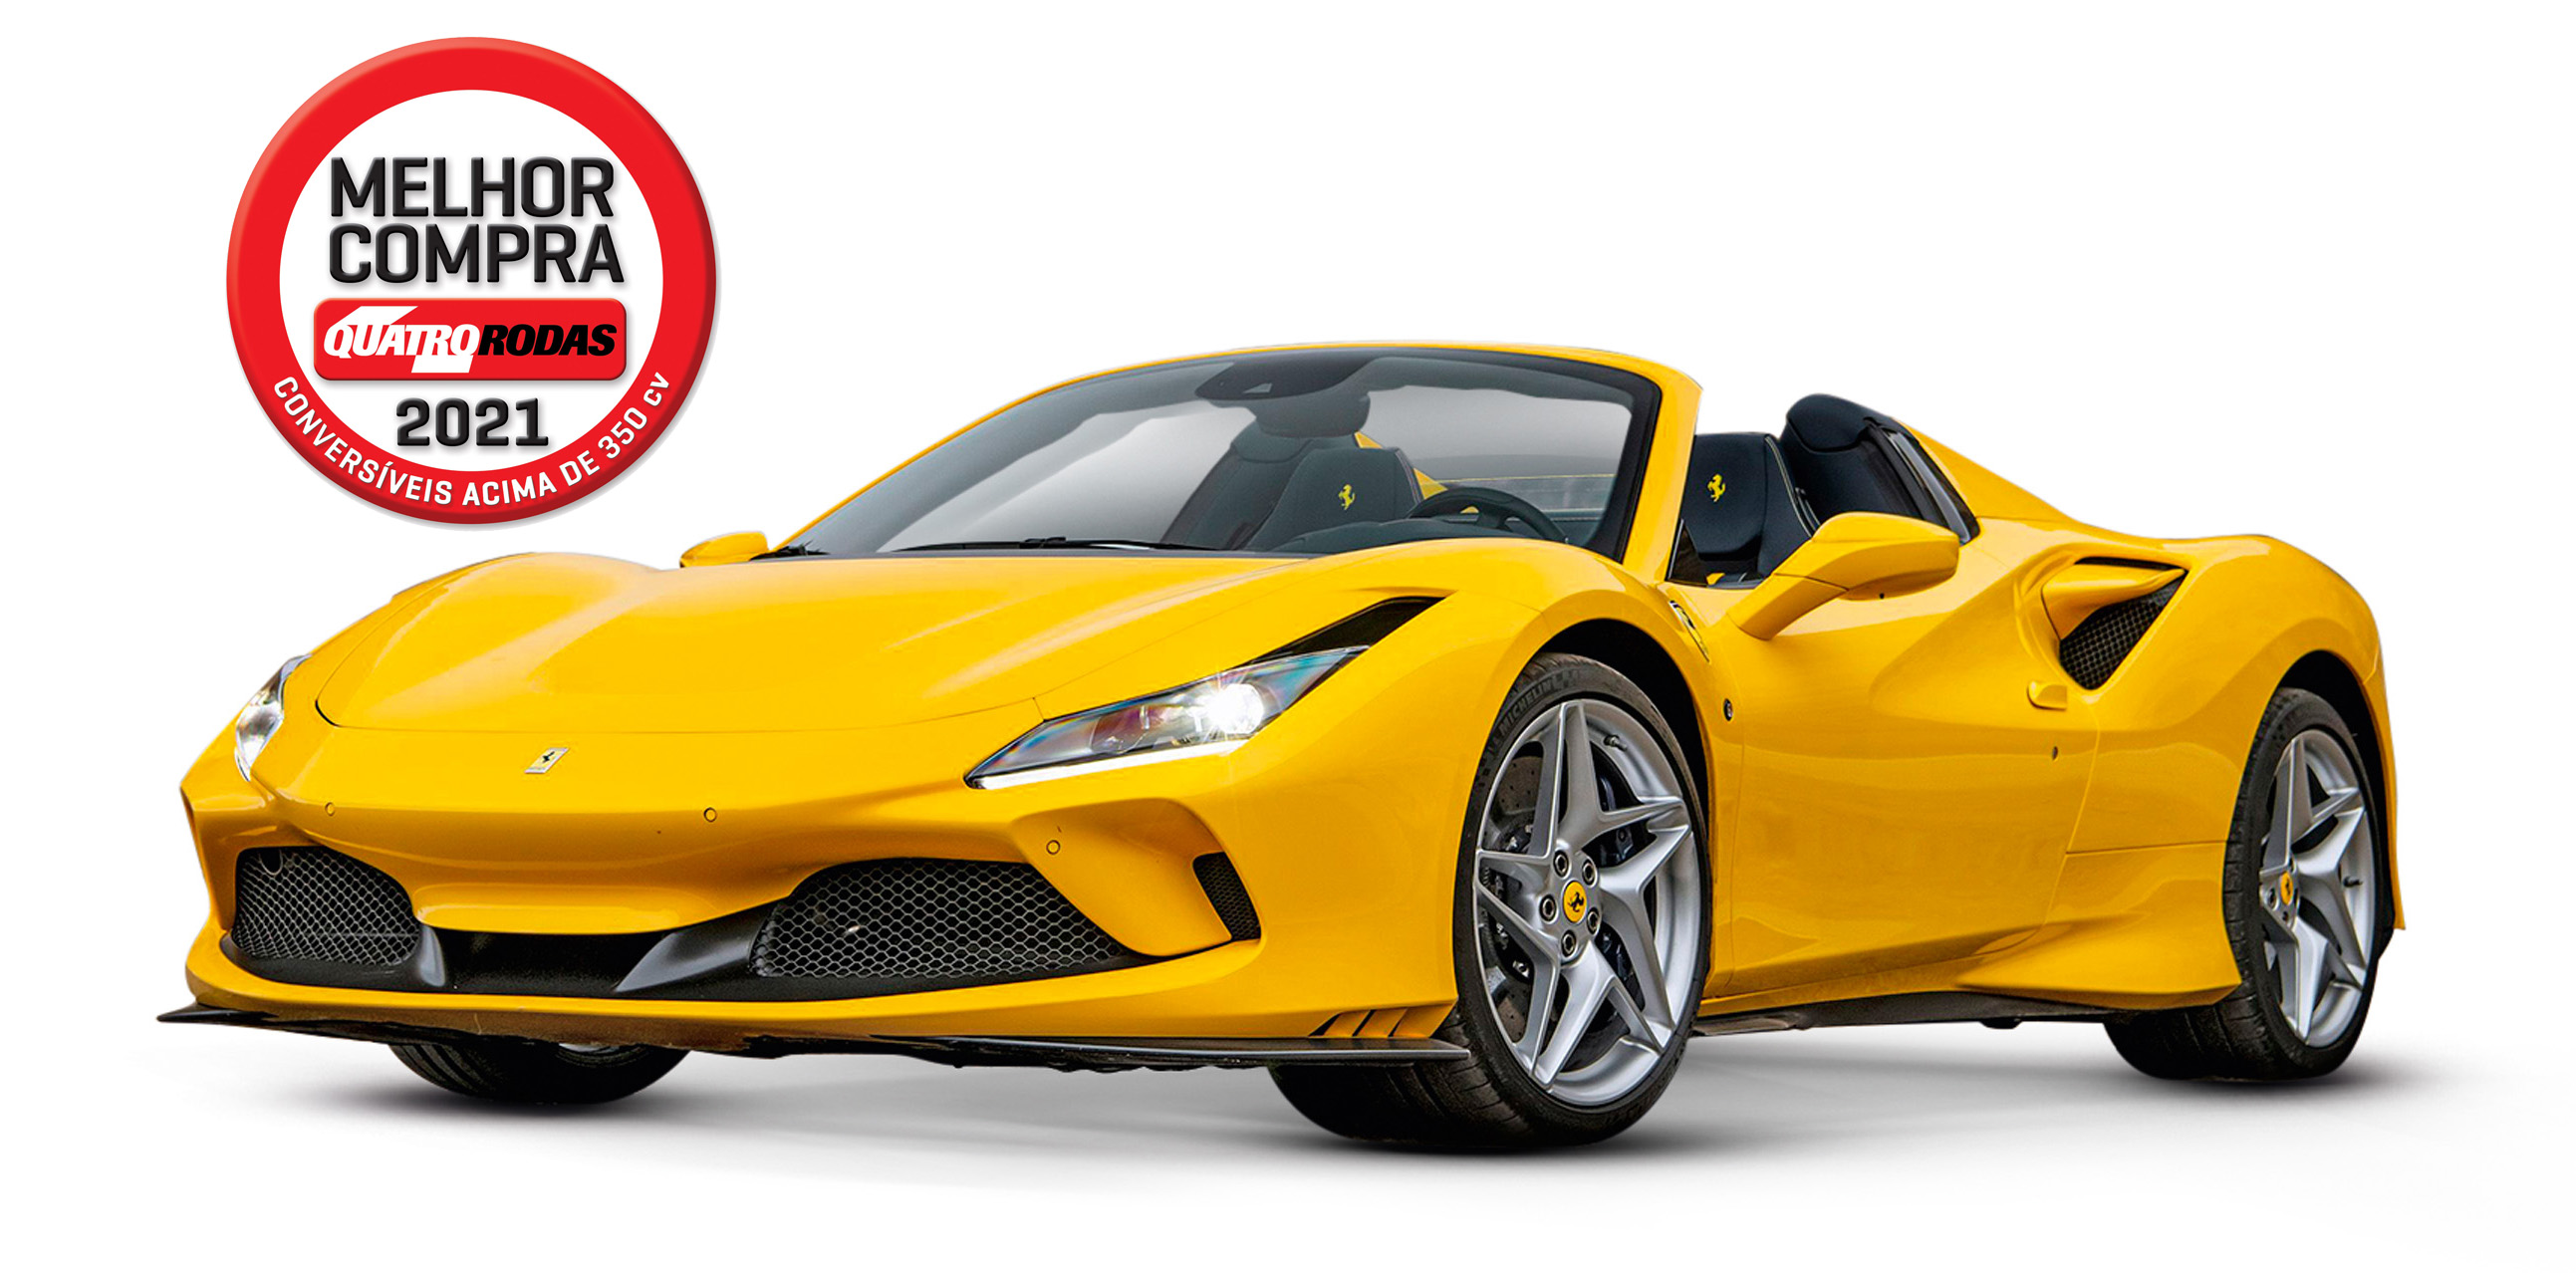 Ferrari F8 Tributo 3.9 Spyder